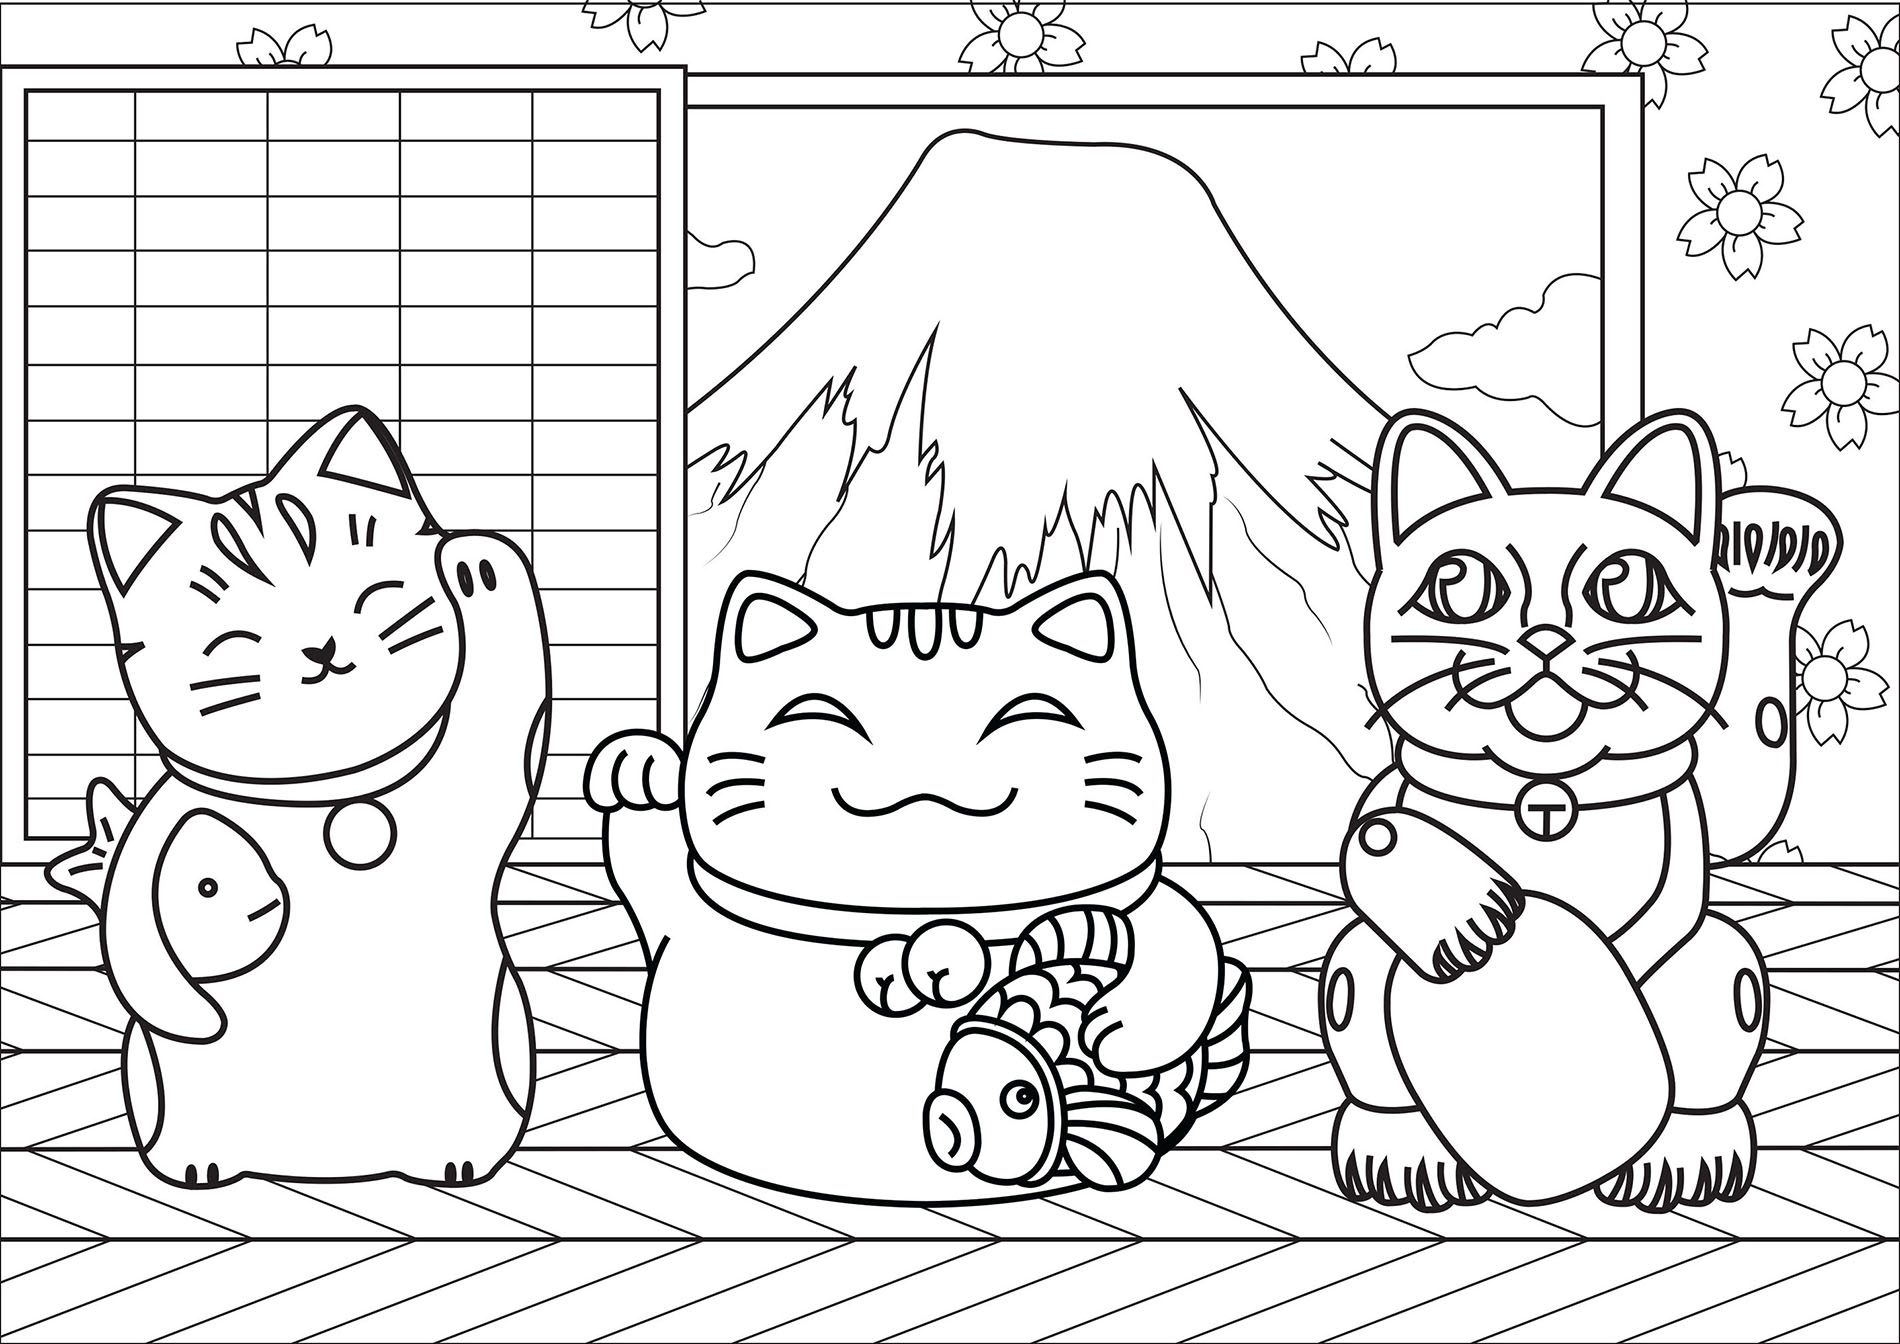 Simple Maneki Neko coloring page to download for free